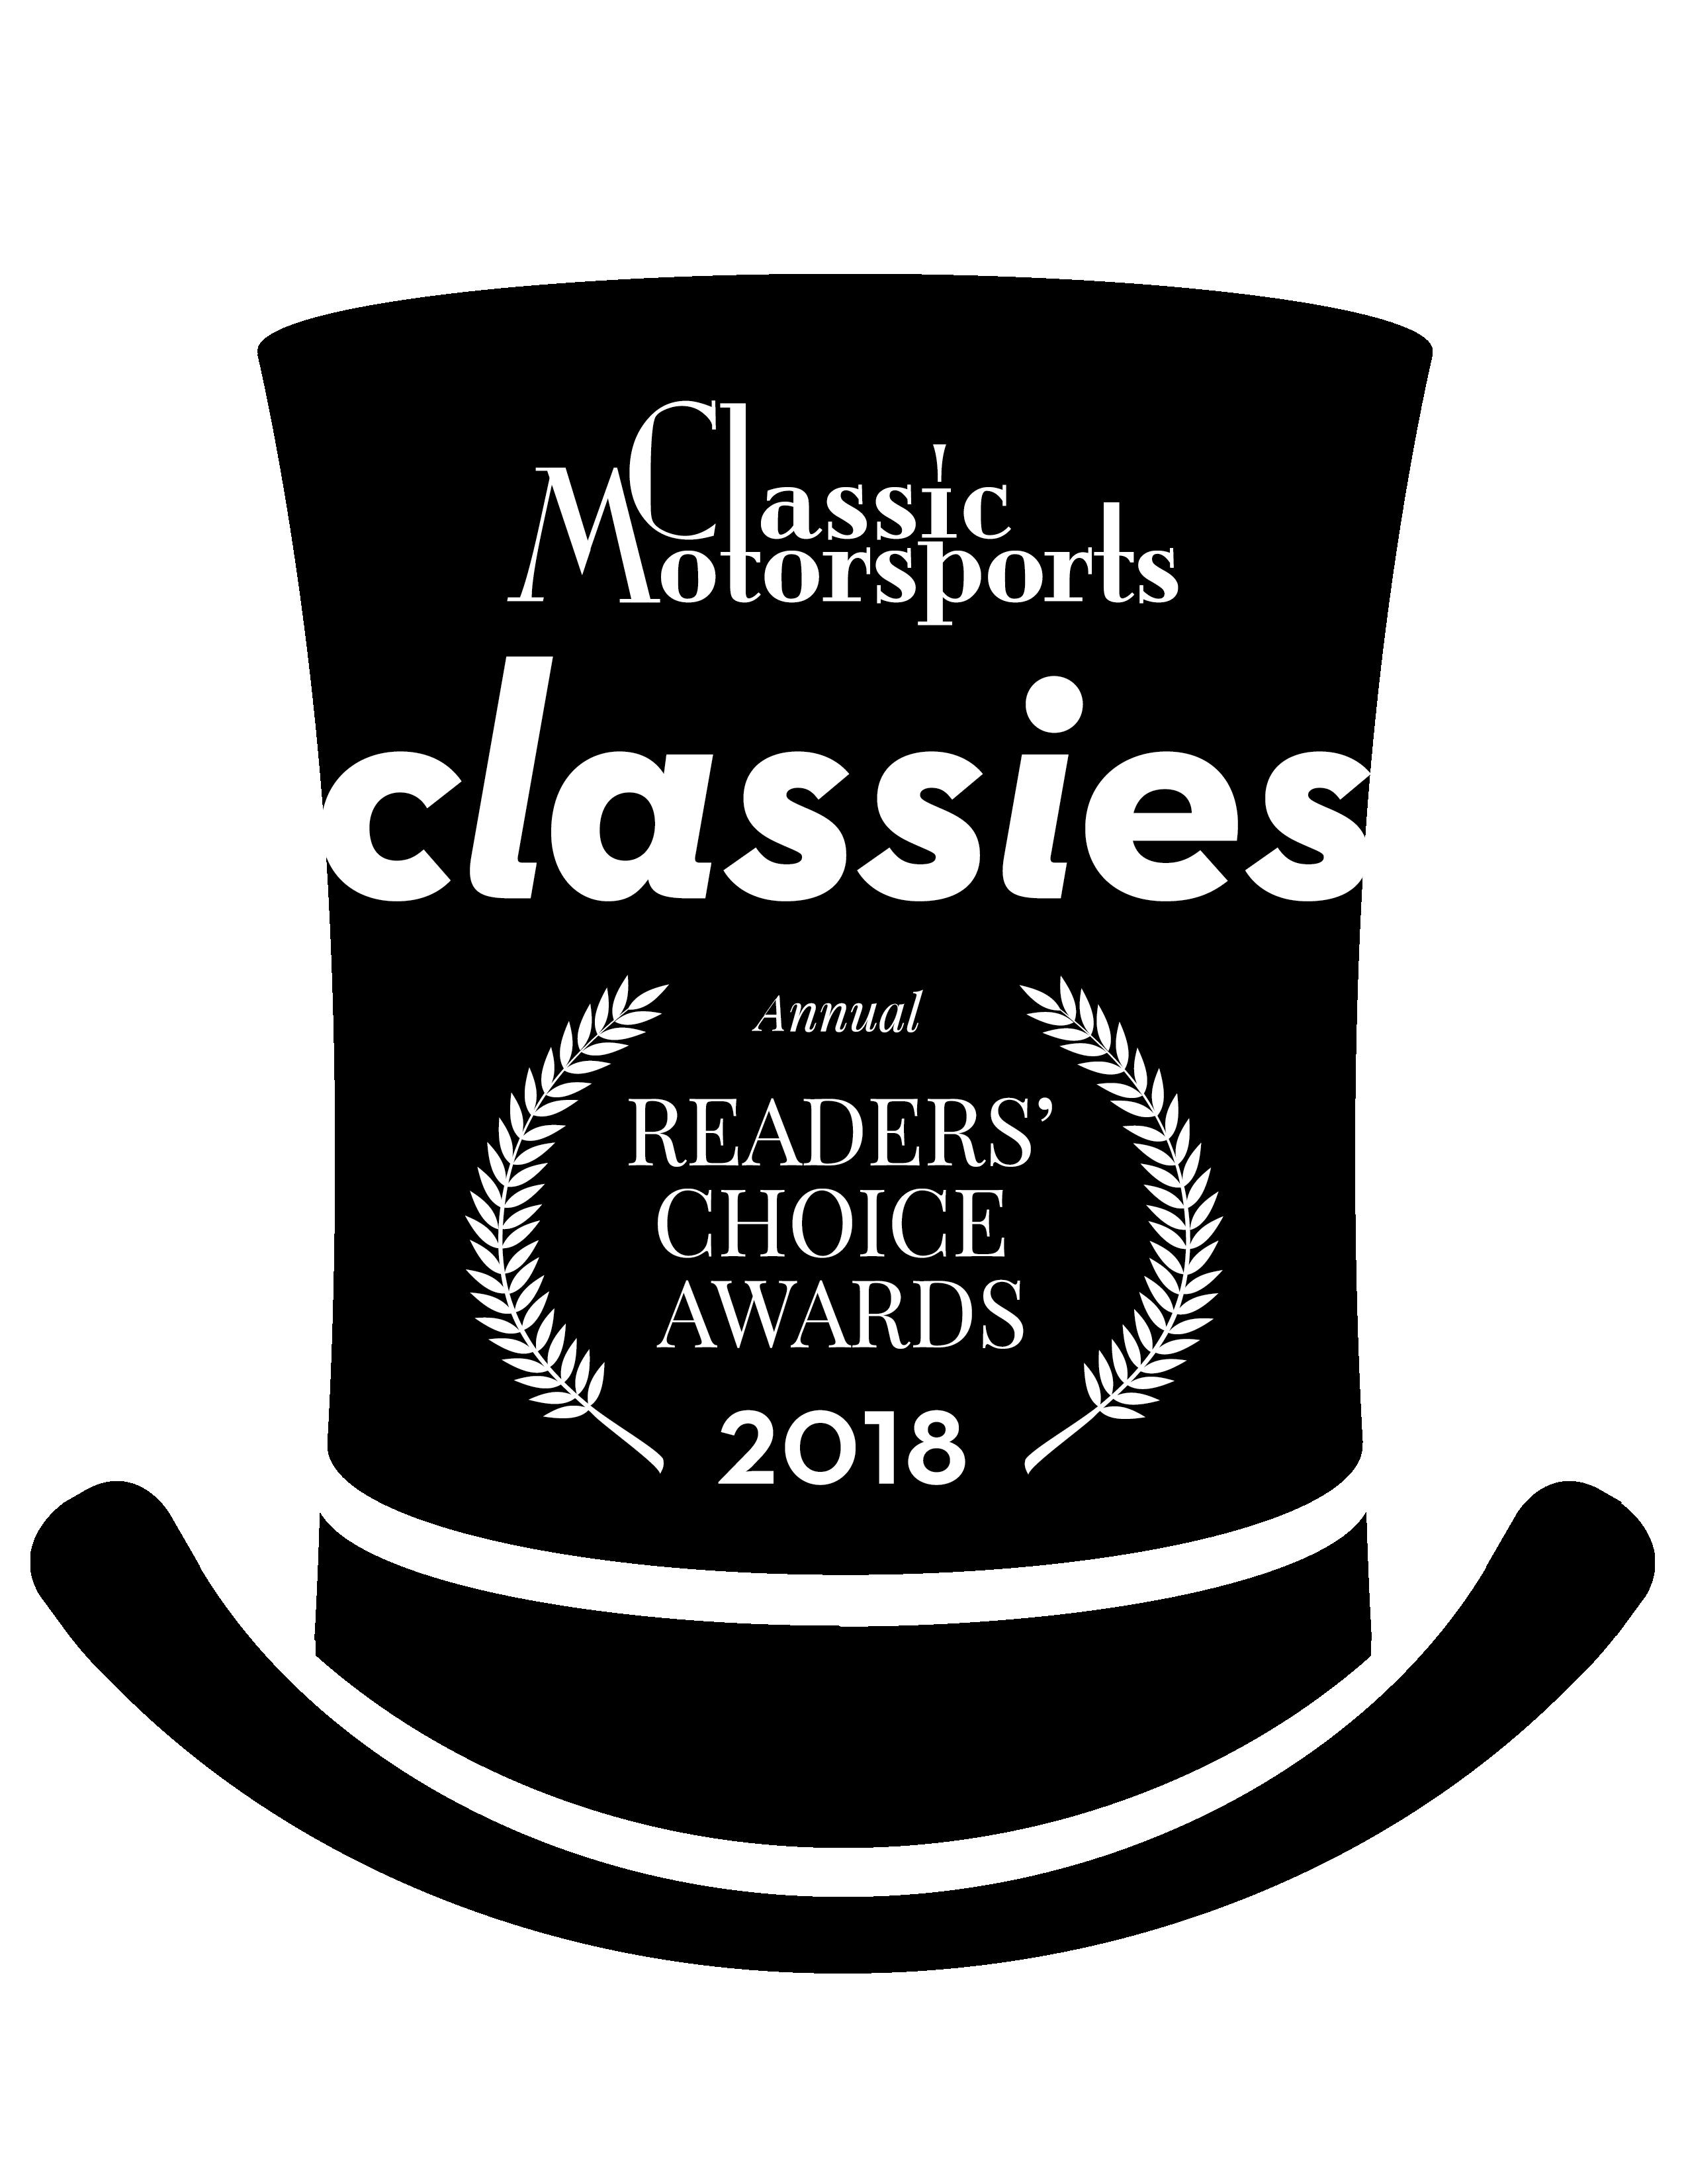 Classic Motorsports Classies